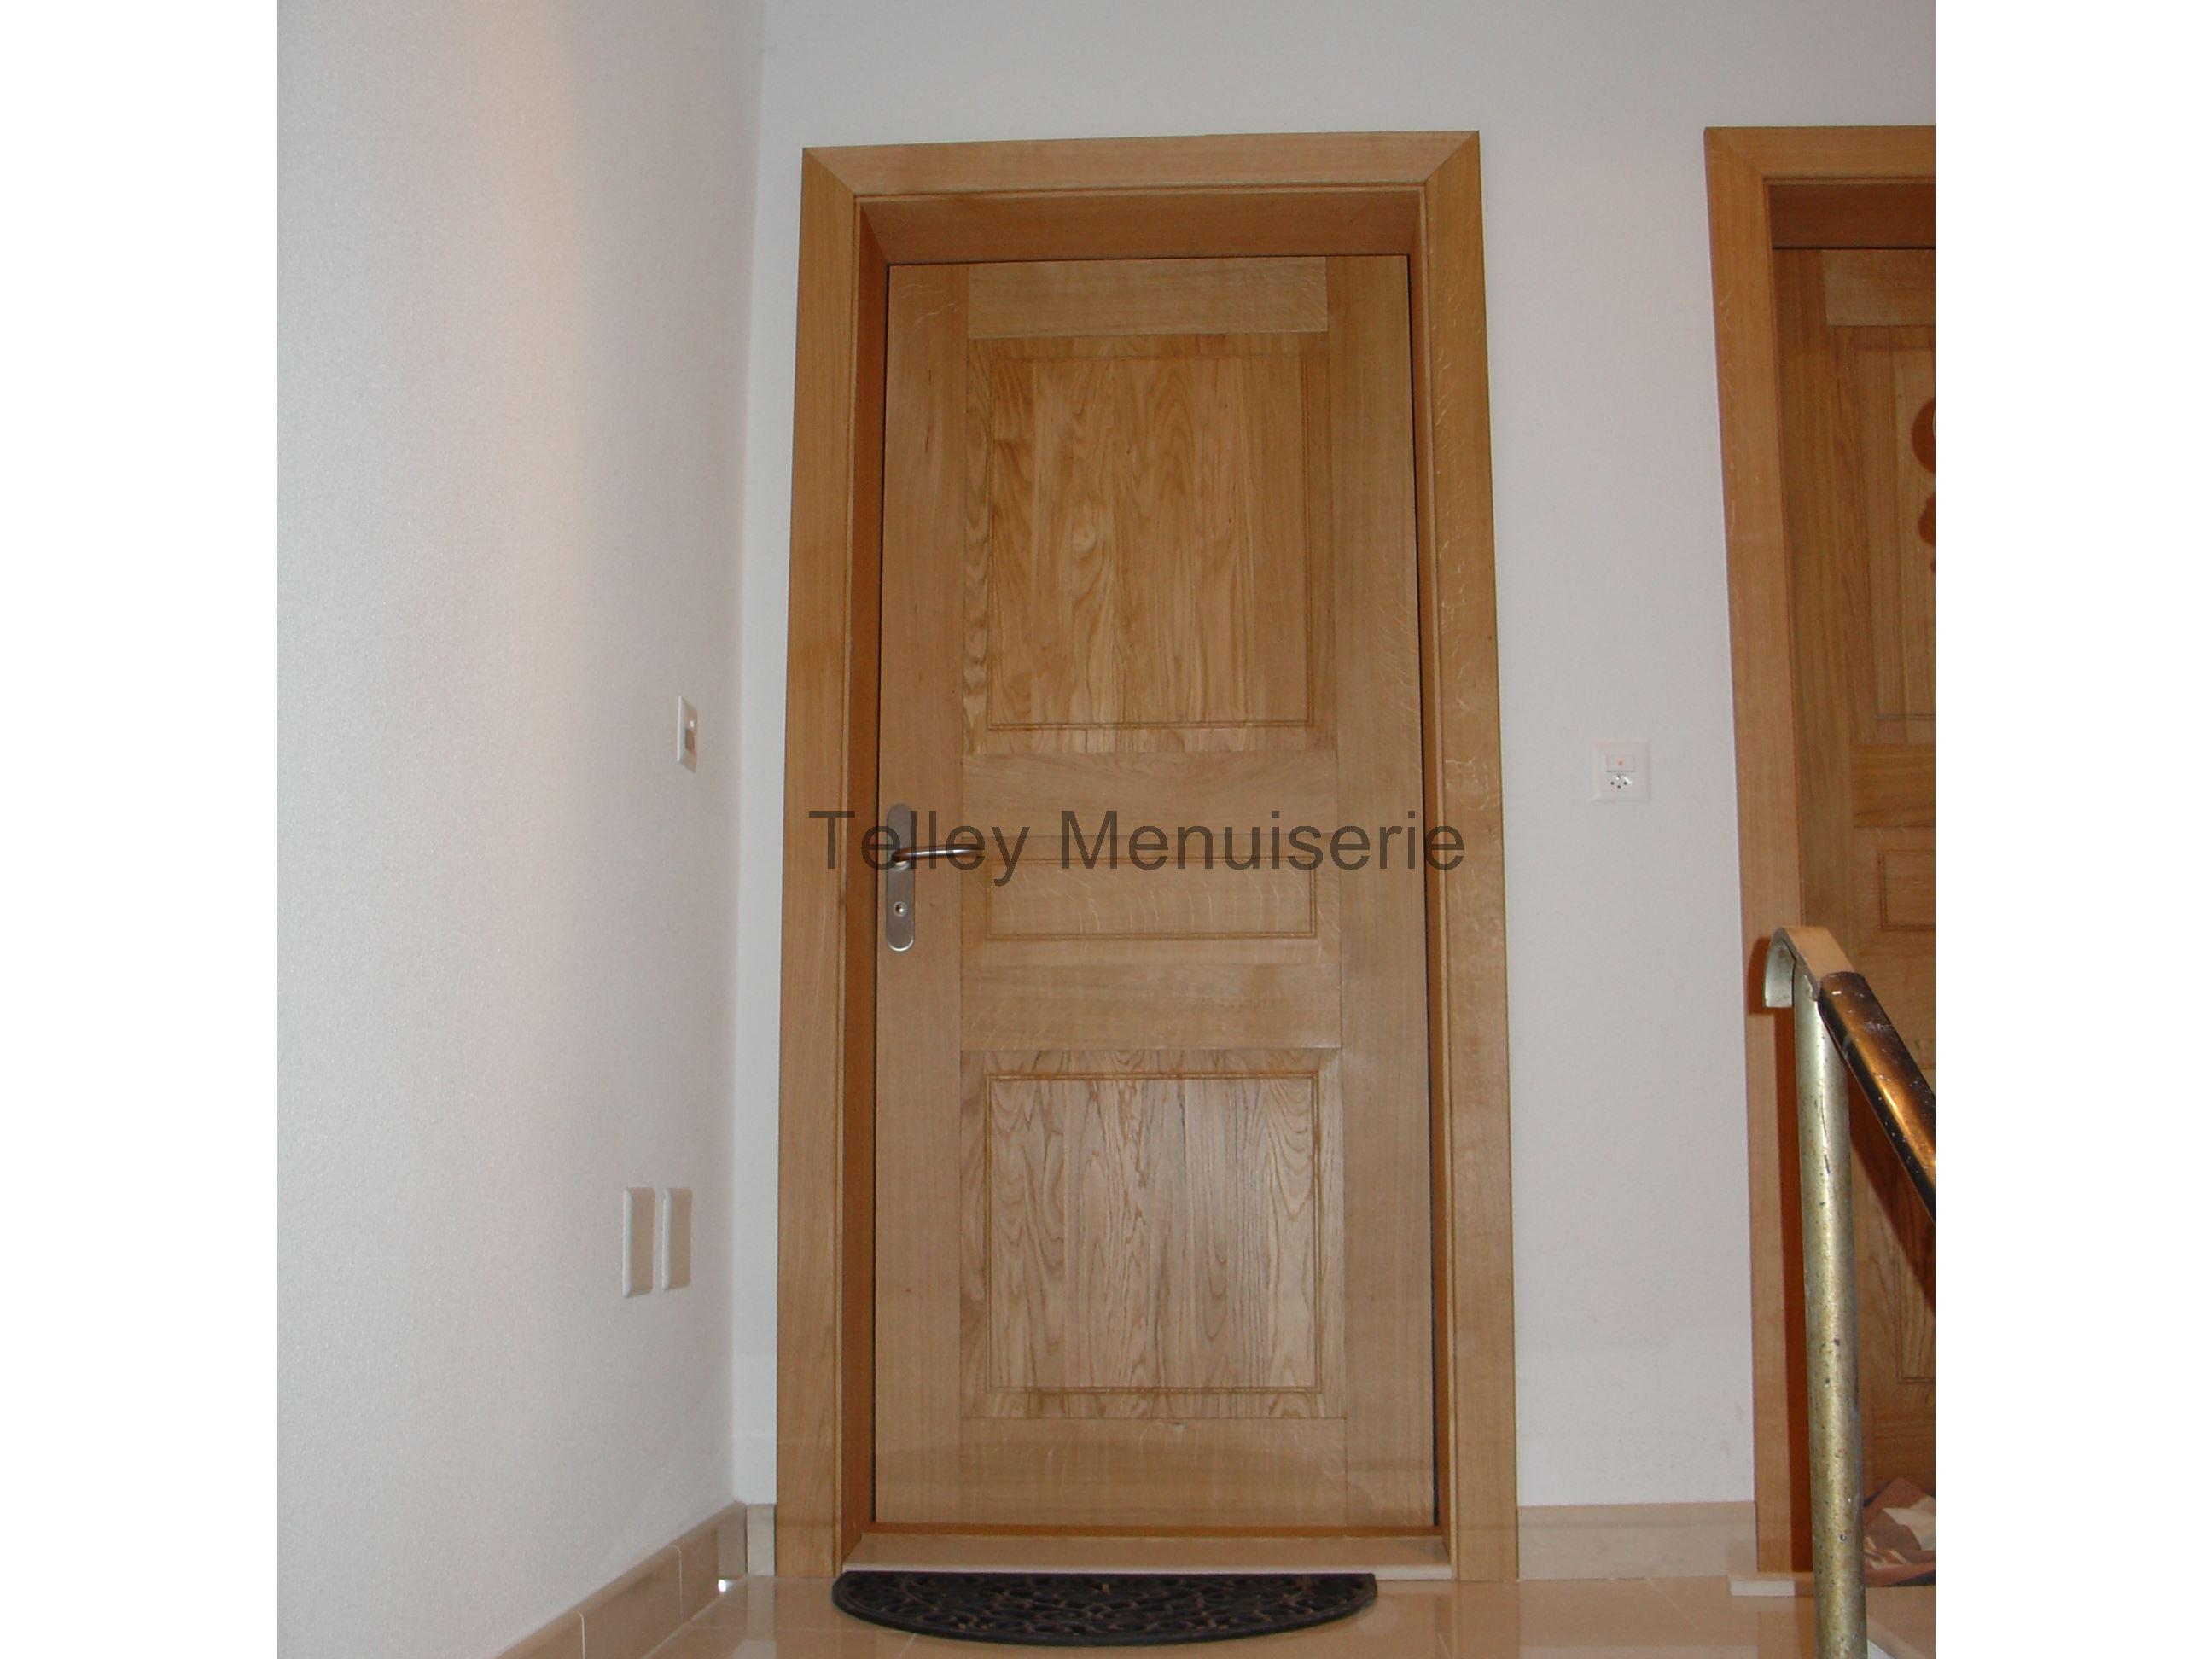 portes pali re coupe feu ei 30 menuiserie telley. Black Bedroom Furniture Sets. Home Design Ideas